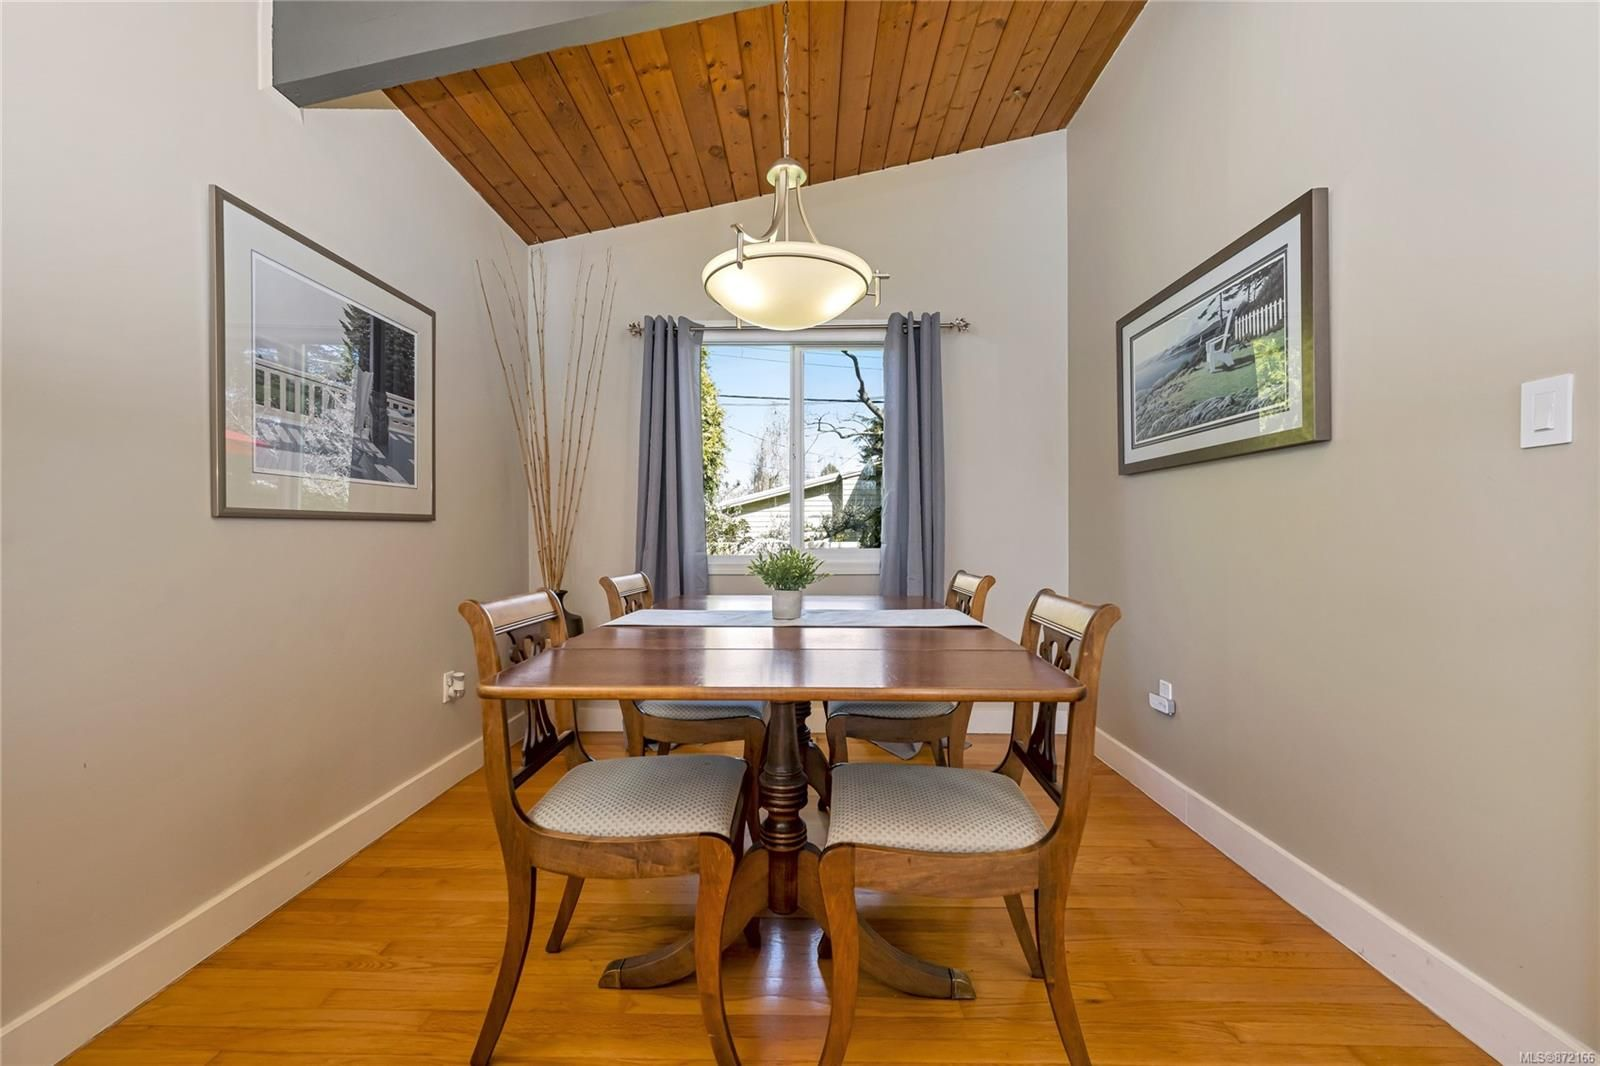 Photo 9: Photos: 1690 Blair Ave in : SE Lambrick Park House for sale (Saanich East)  : MLS®# 872166